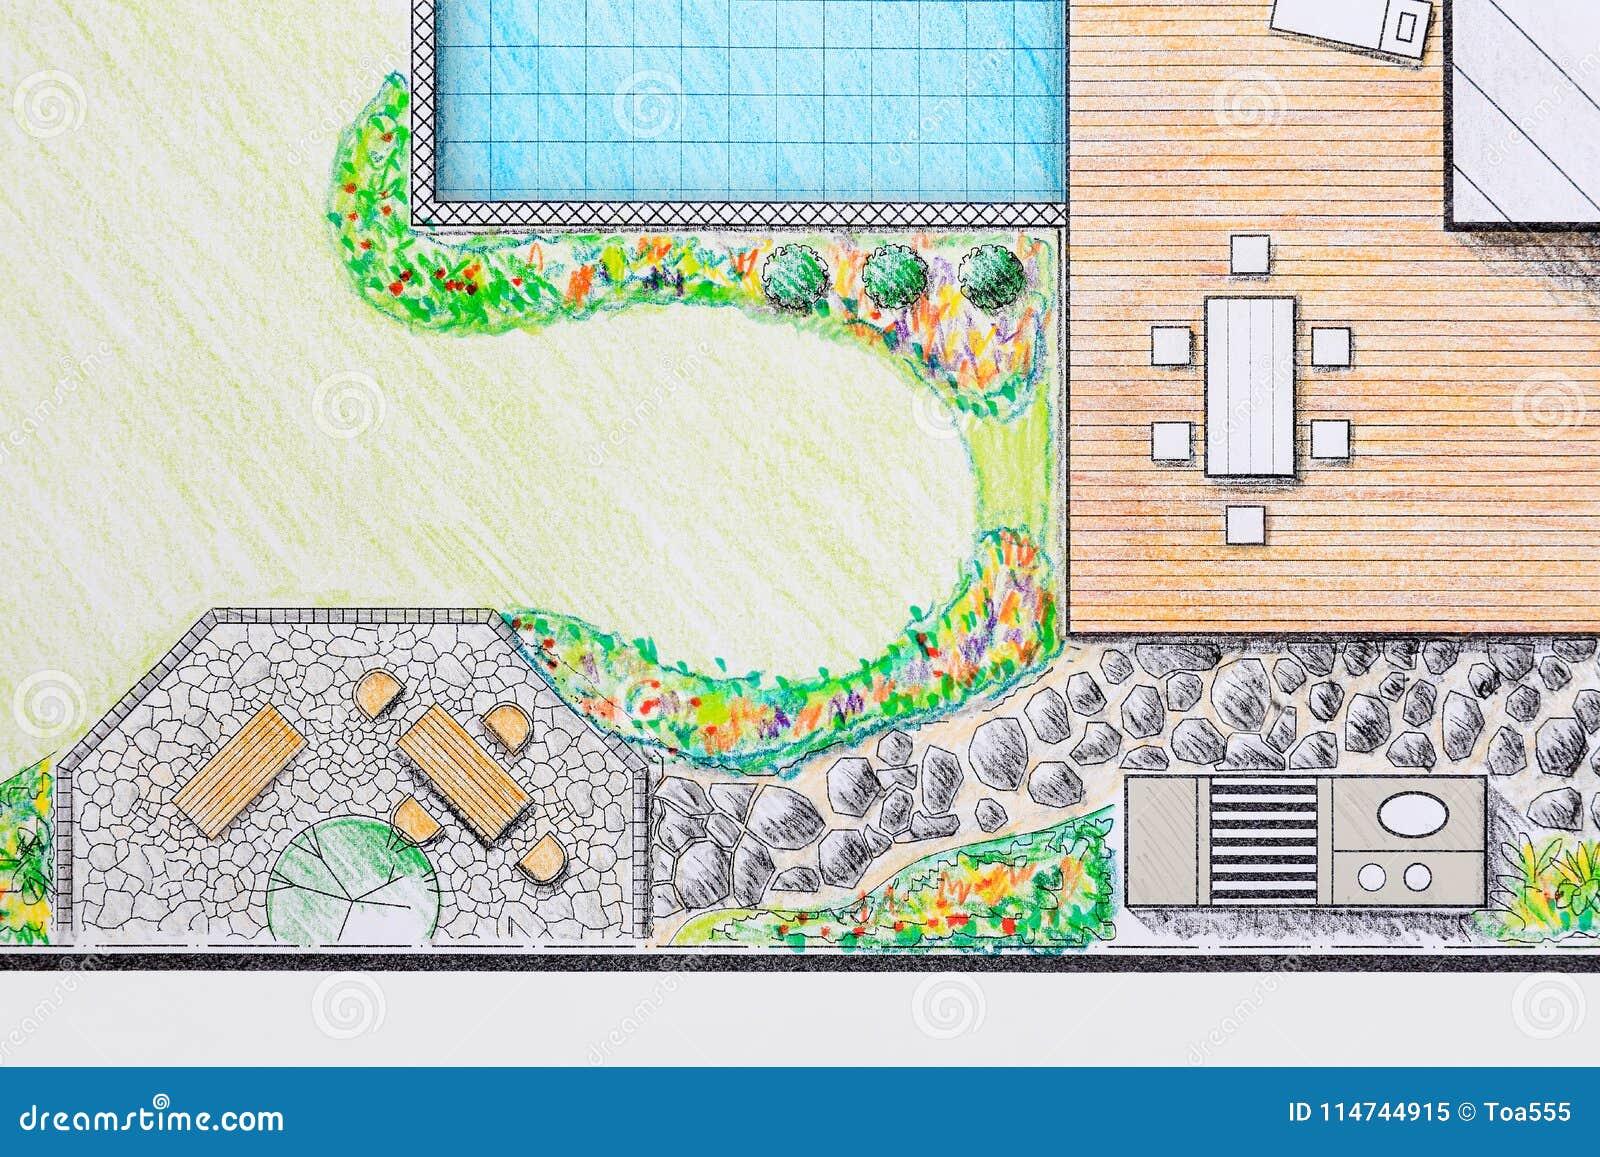 Landscape Architect Design Patio Backyard Plan